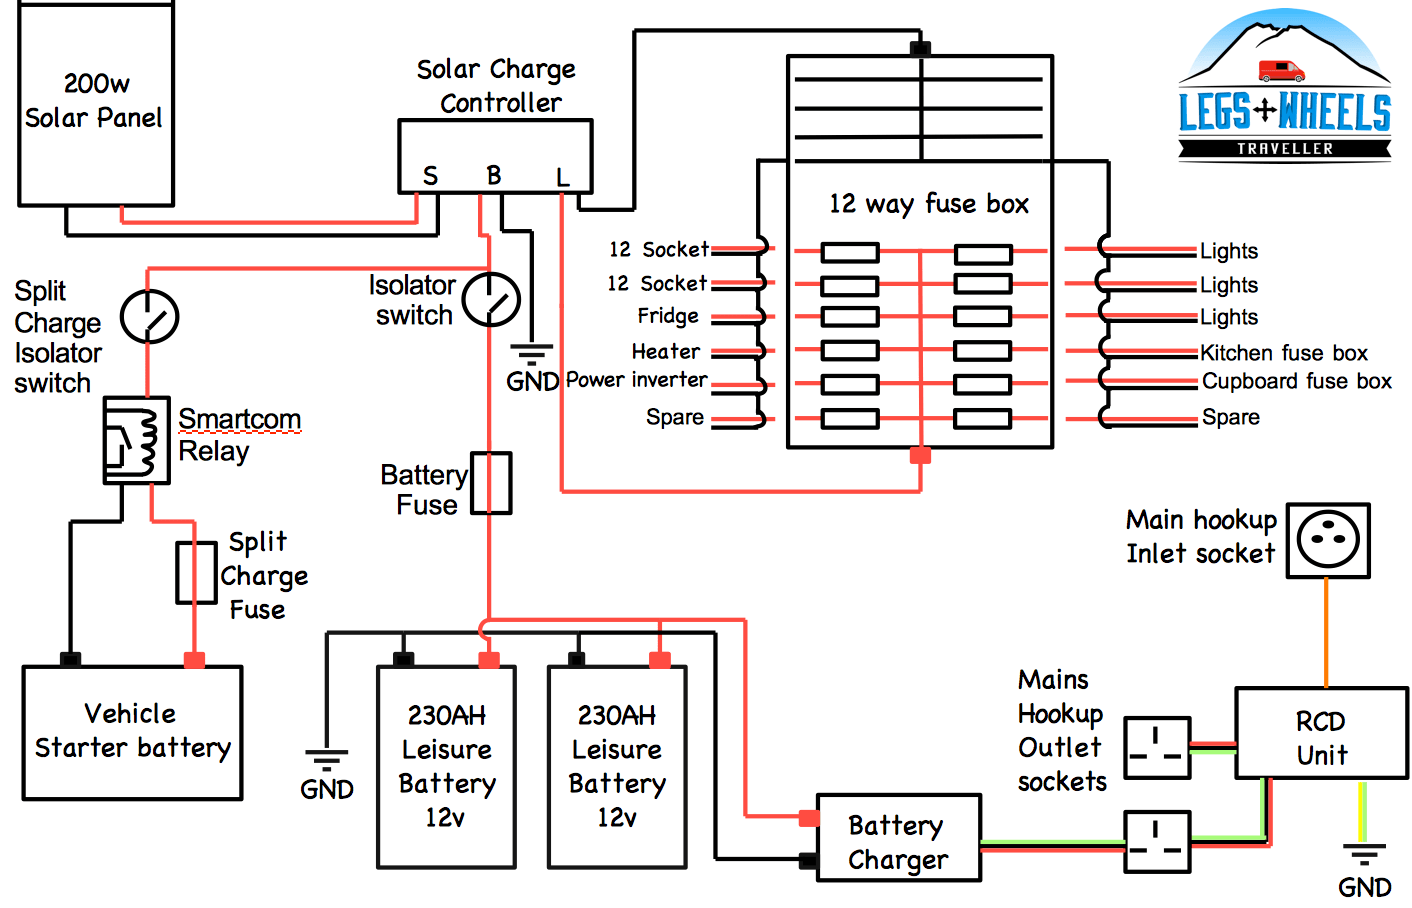 medium resolution of 12v electric system diagram in ford transit van conversion